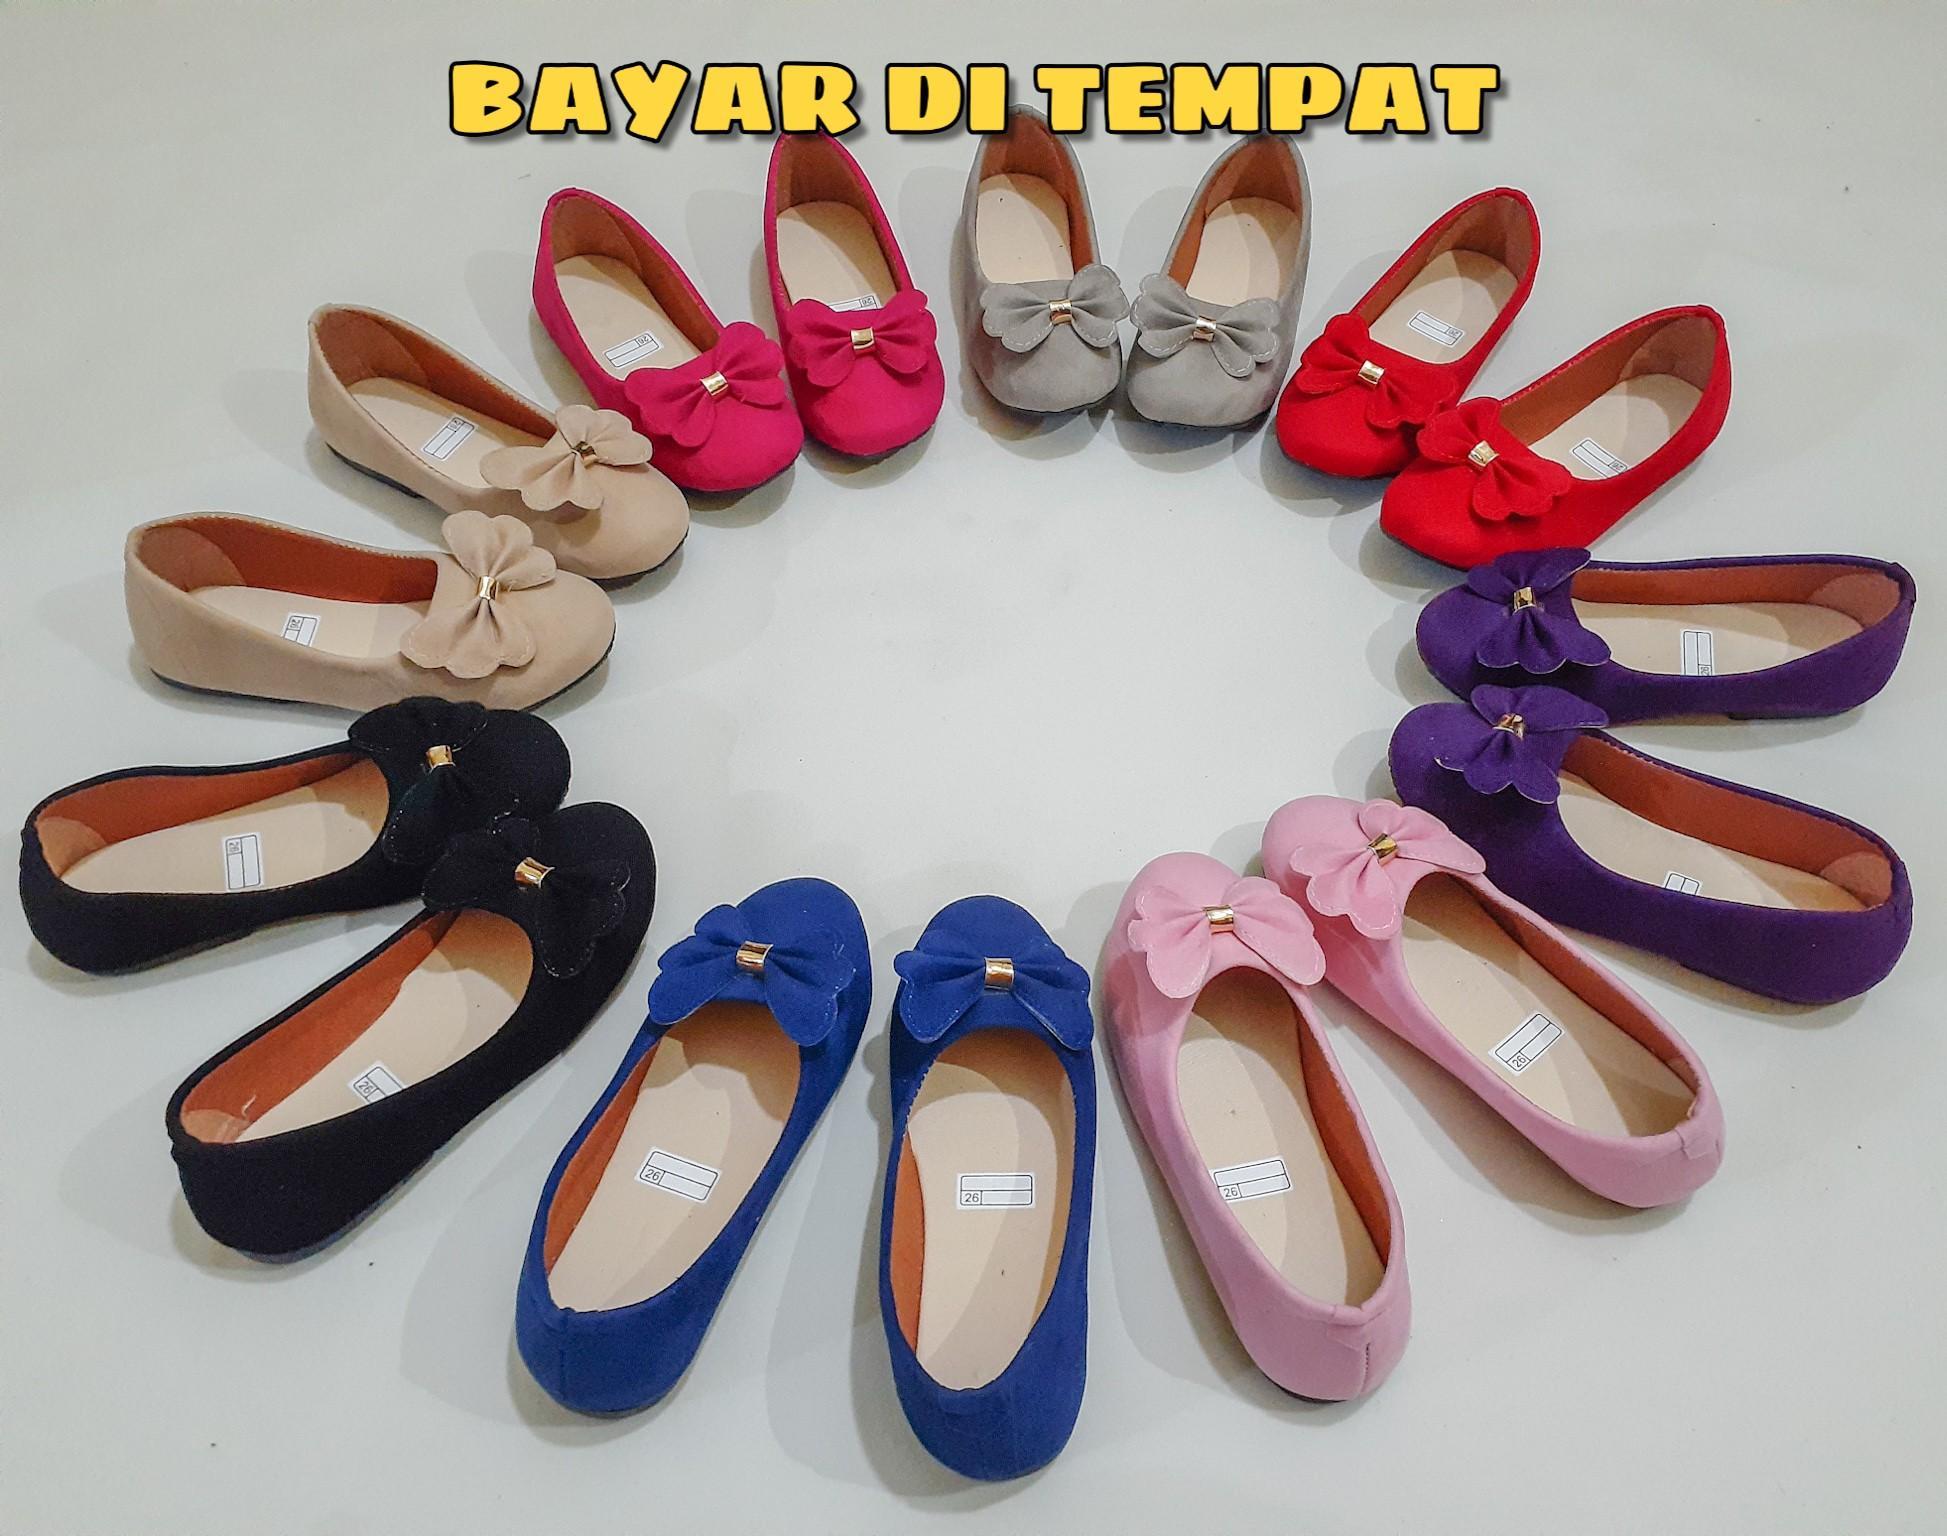 Jual Sepatu Anak Perempuan Terbaru | lazada.co.id